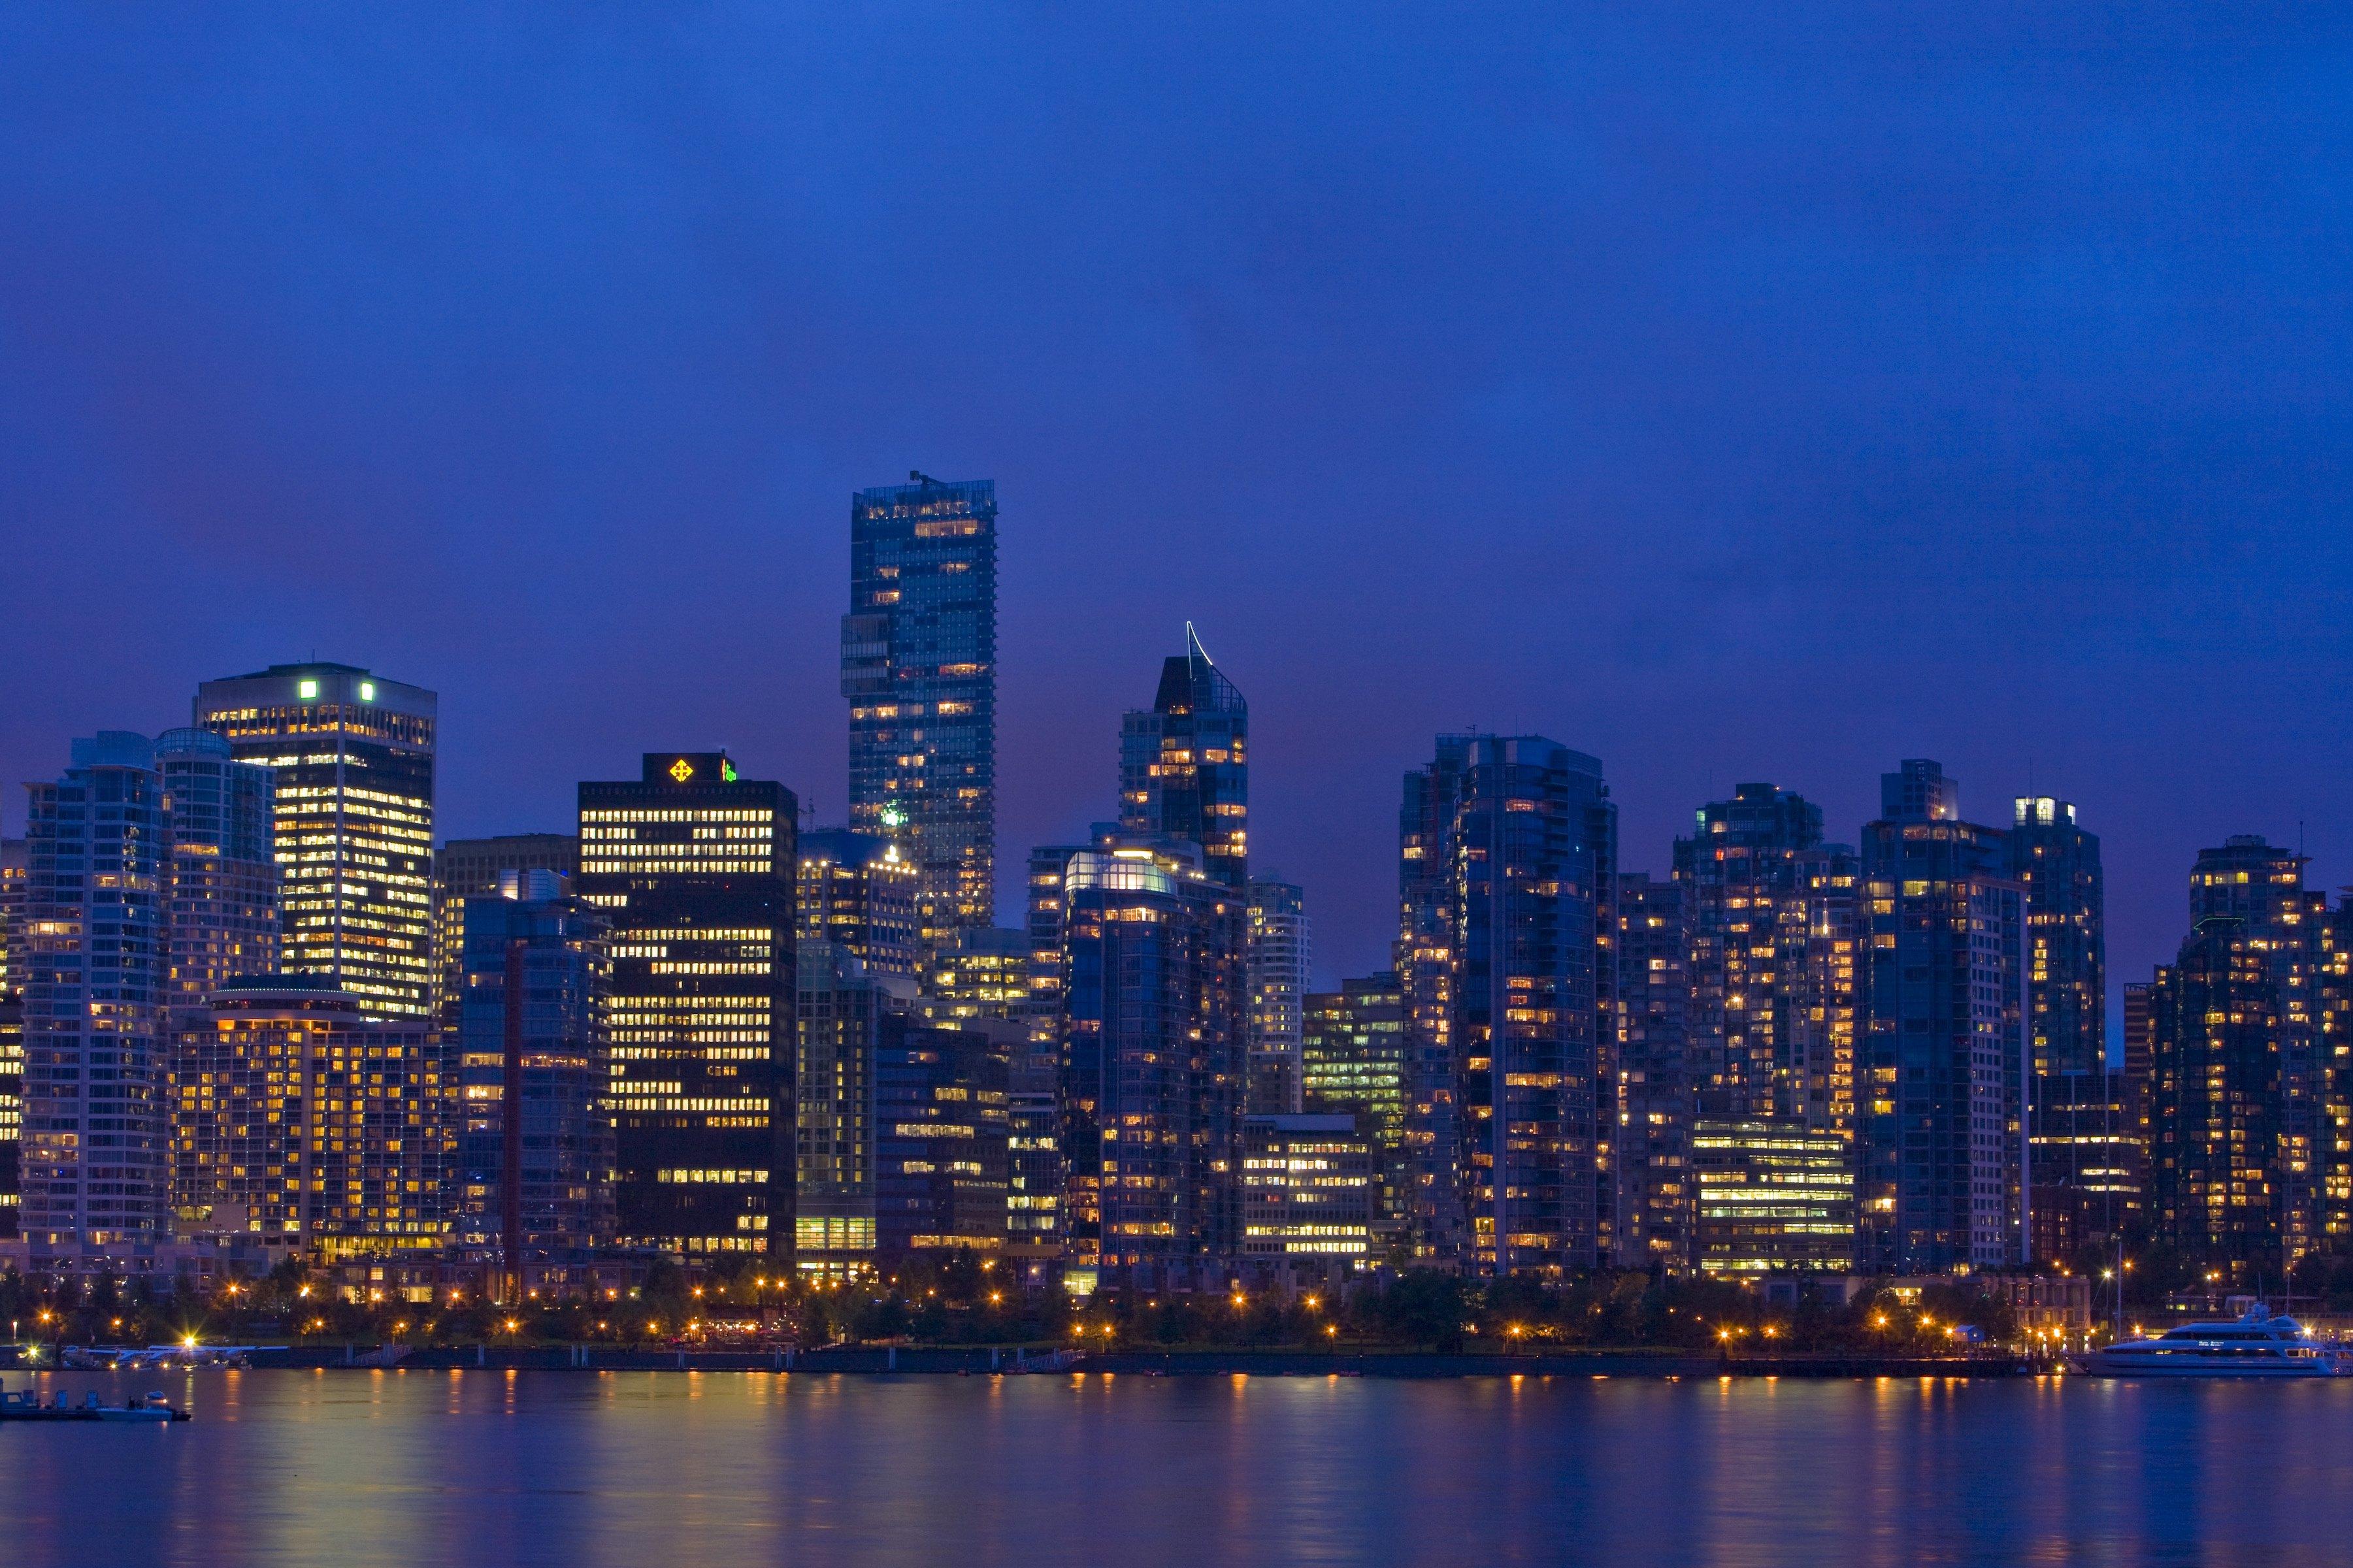 Vancouver: 2010 Winter Olympics Host City